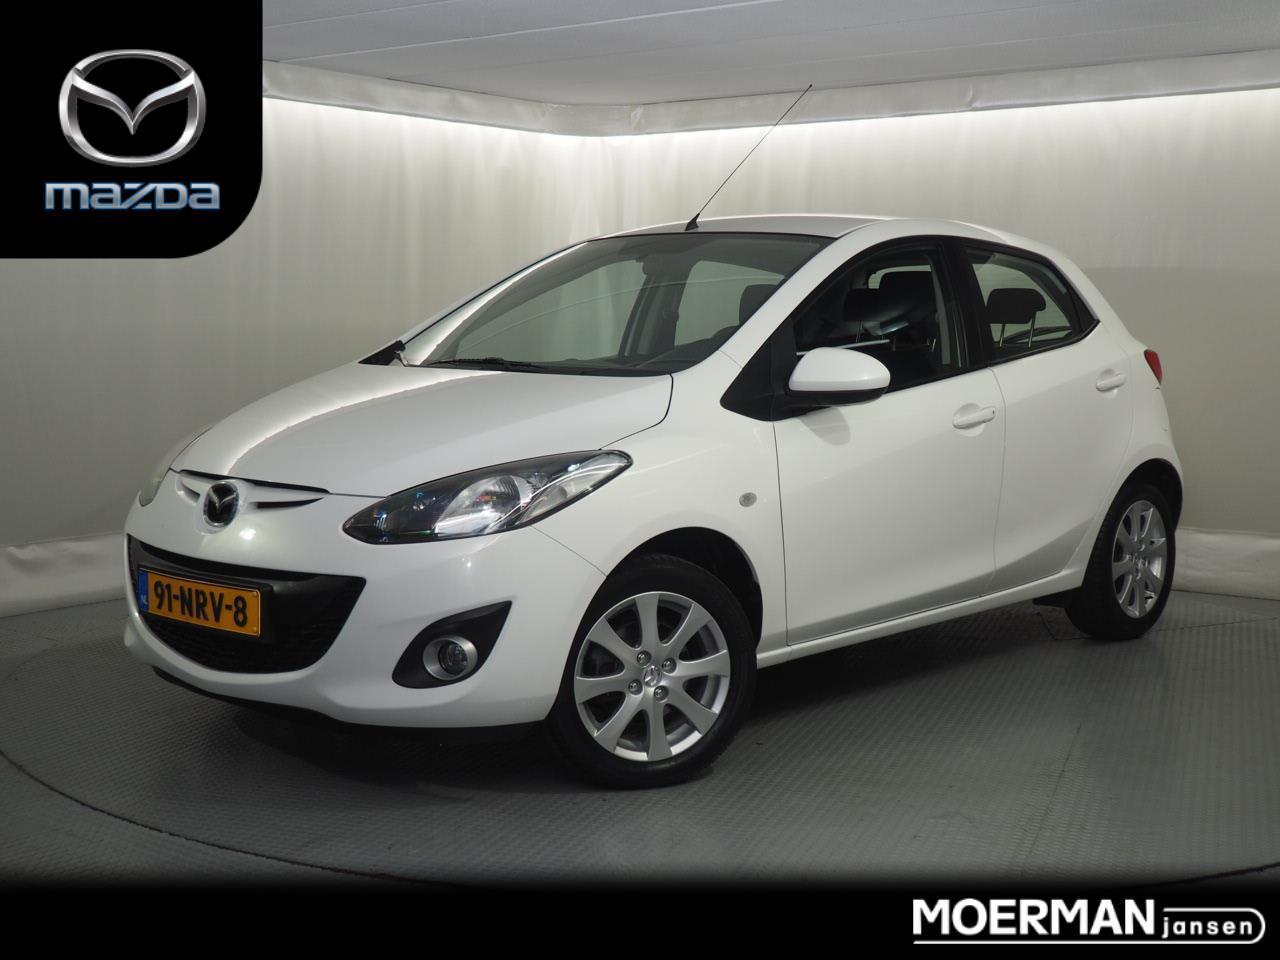 Mazda 2 Ts+ face lift 5-drs / airco / dealer onderhouden / afneembare trekhaak